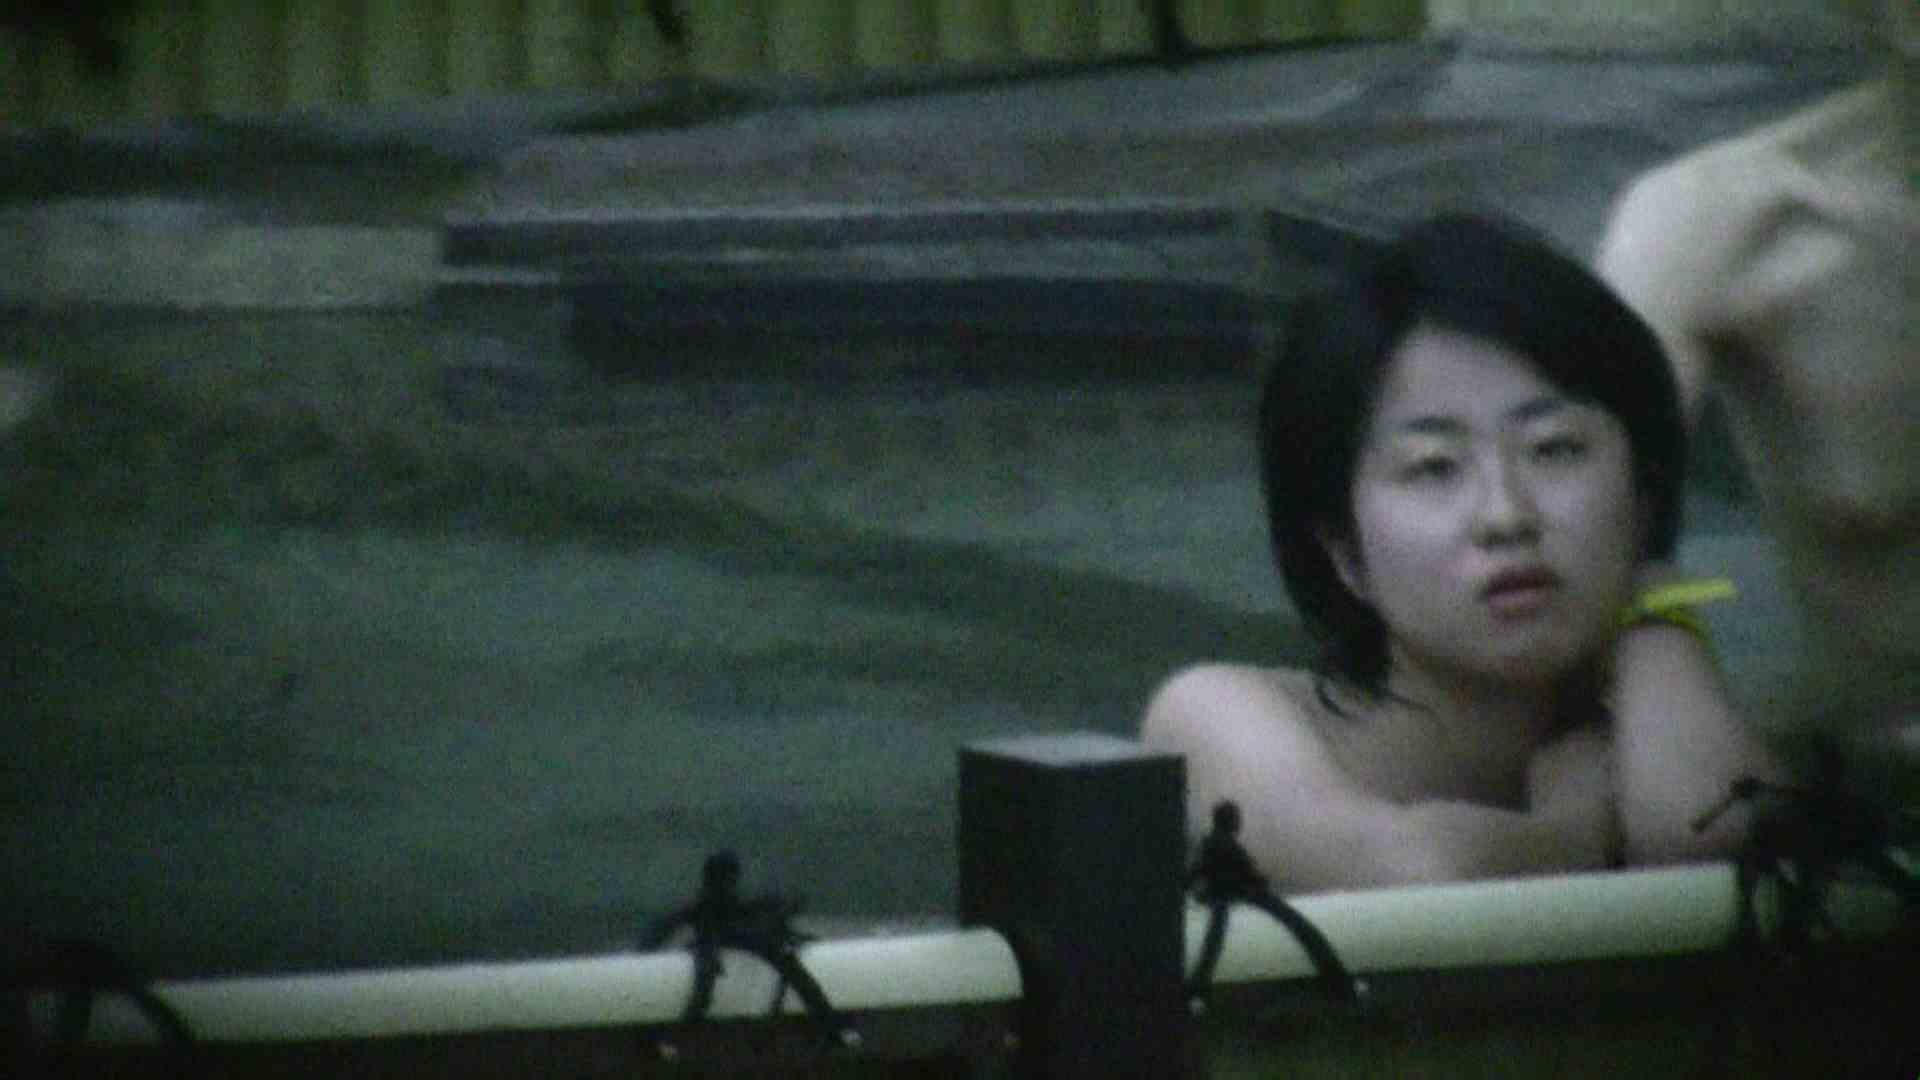 Aquaな露天風呂Vol.112 0 | 0  68連発 47